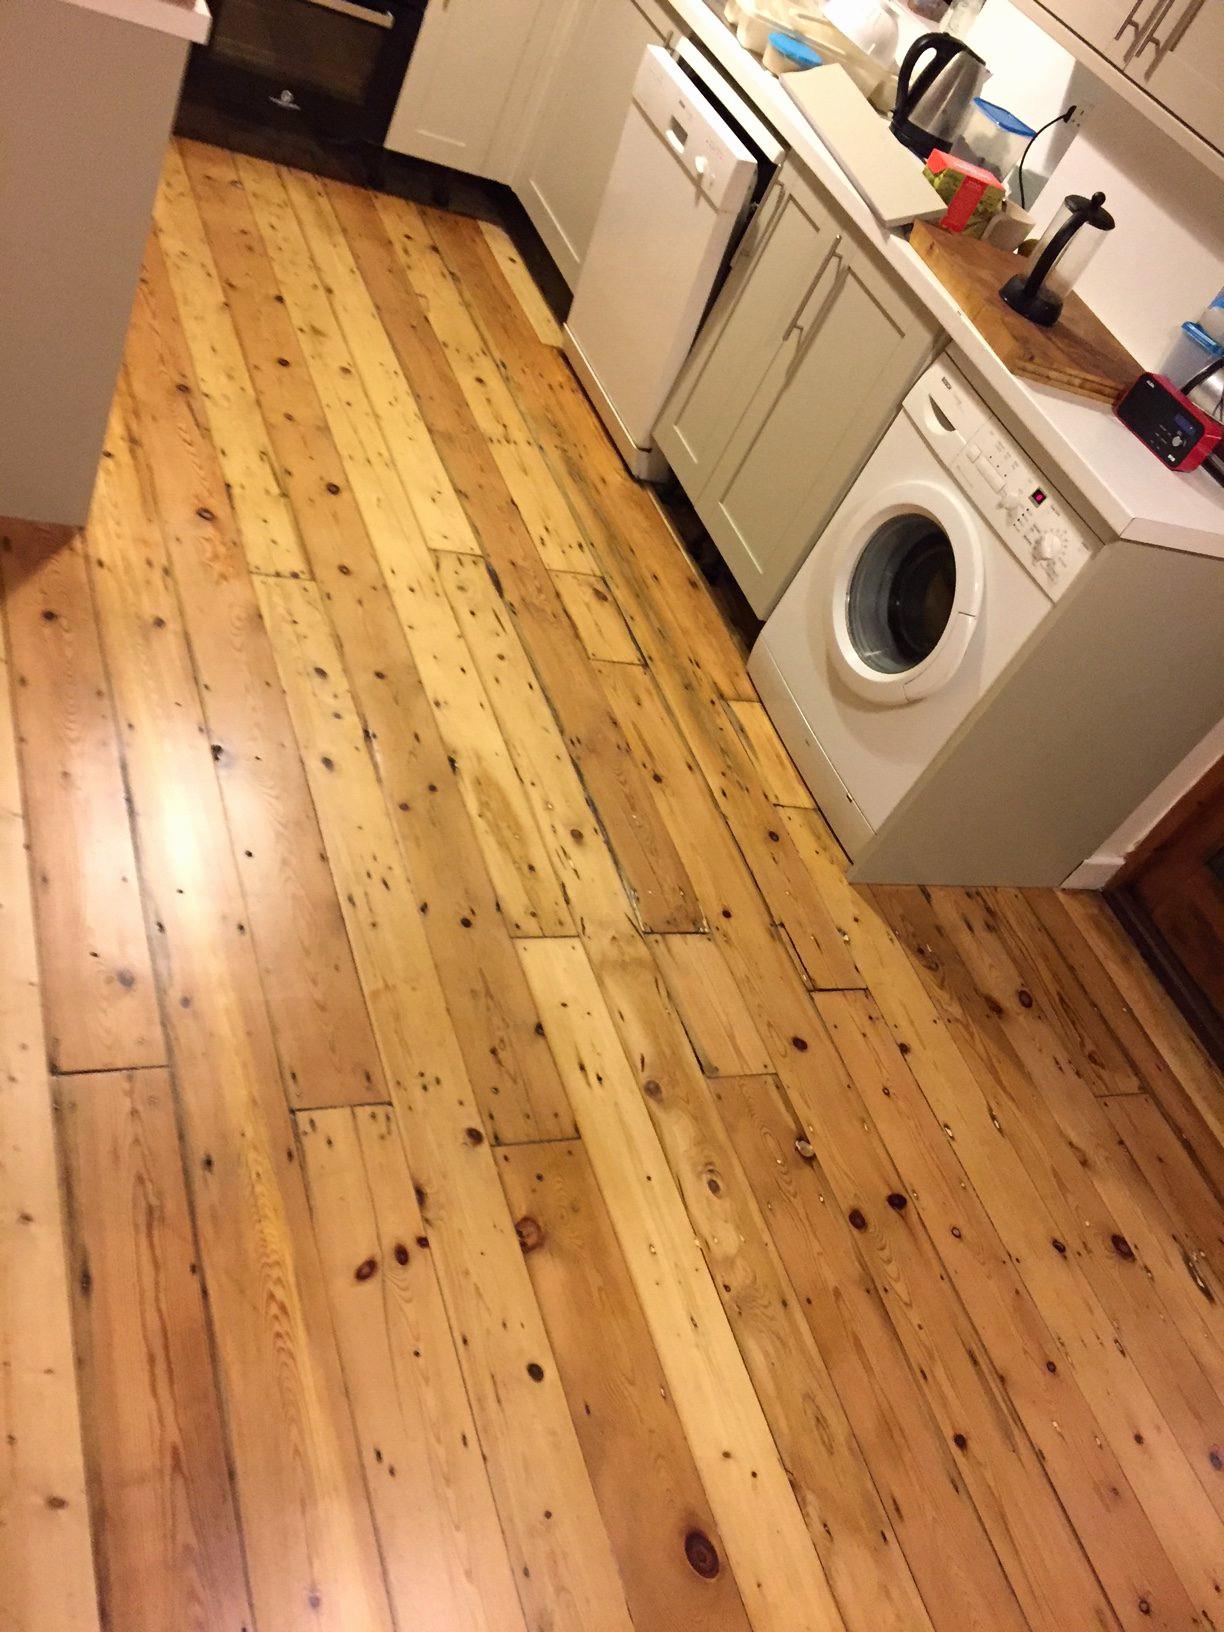 denver hardwood floor refinishing cost of how to refinish a wood floor sand and stain hardwood floors cost within how to refinish a wood floor wood floor stain colors chart awesome 50 new how to